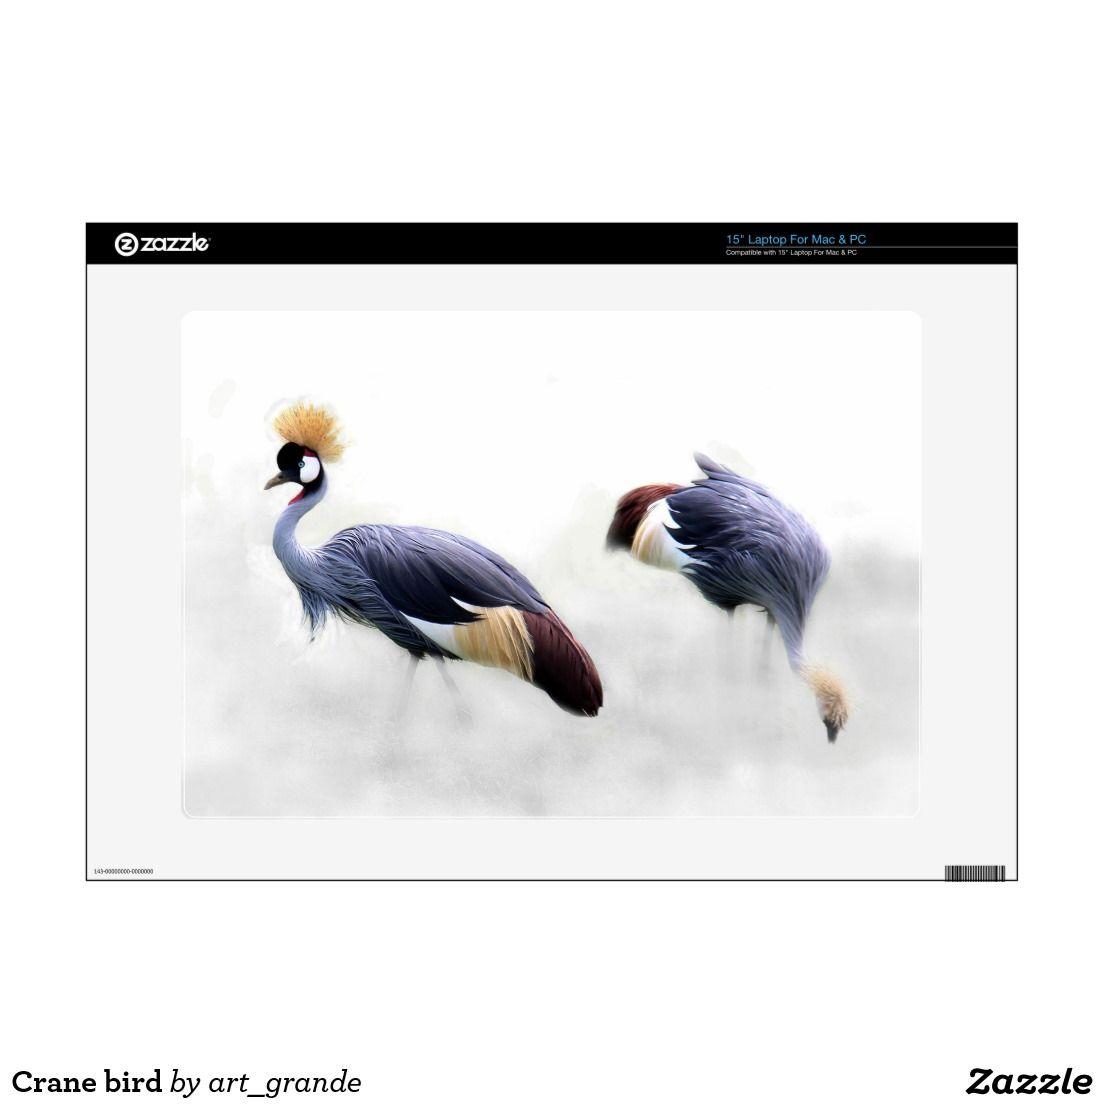 Crane bird decal for laptop